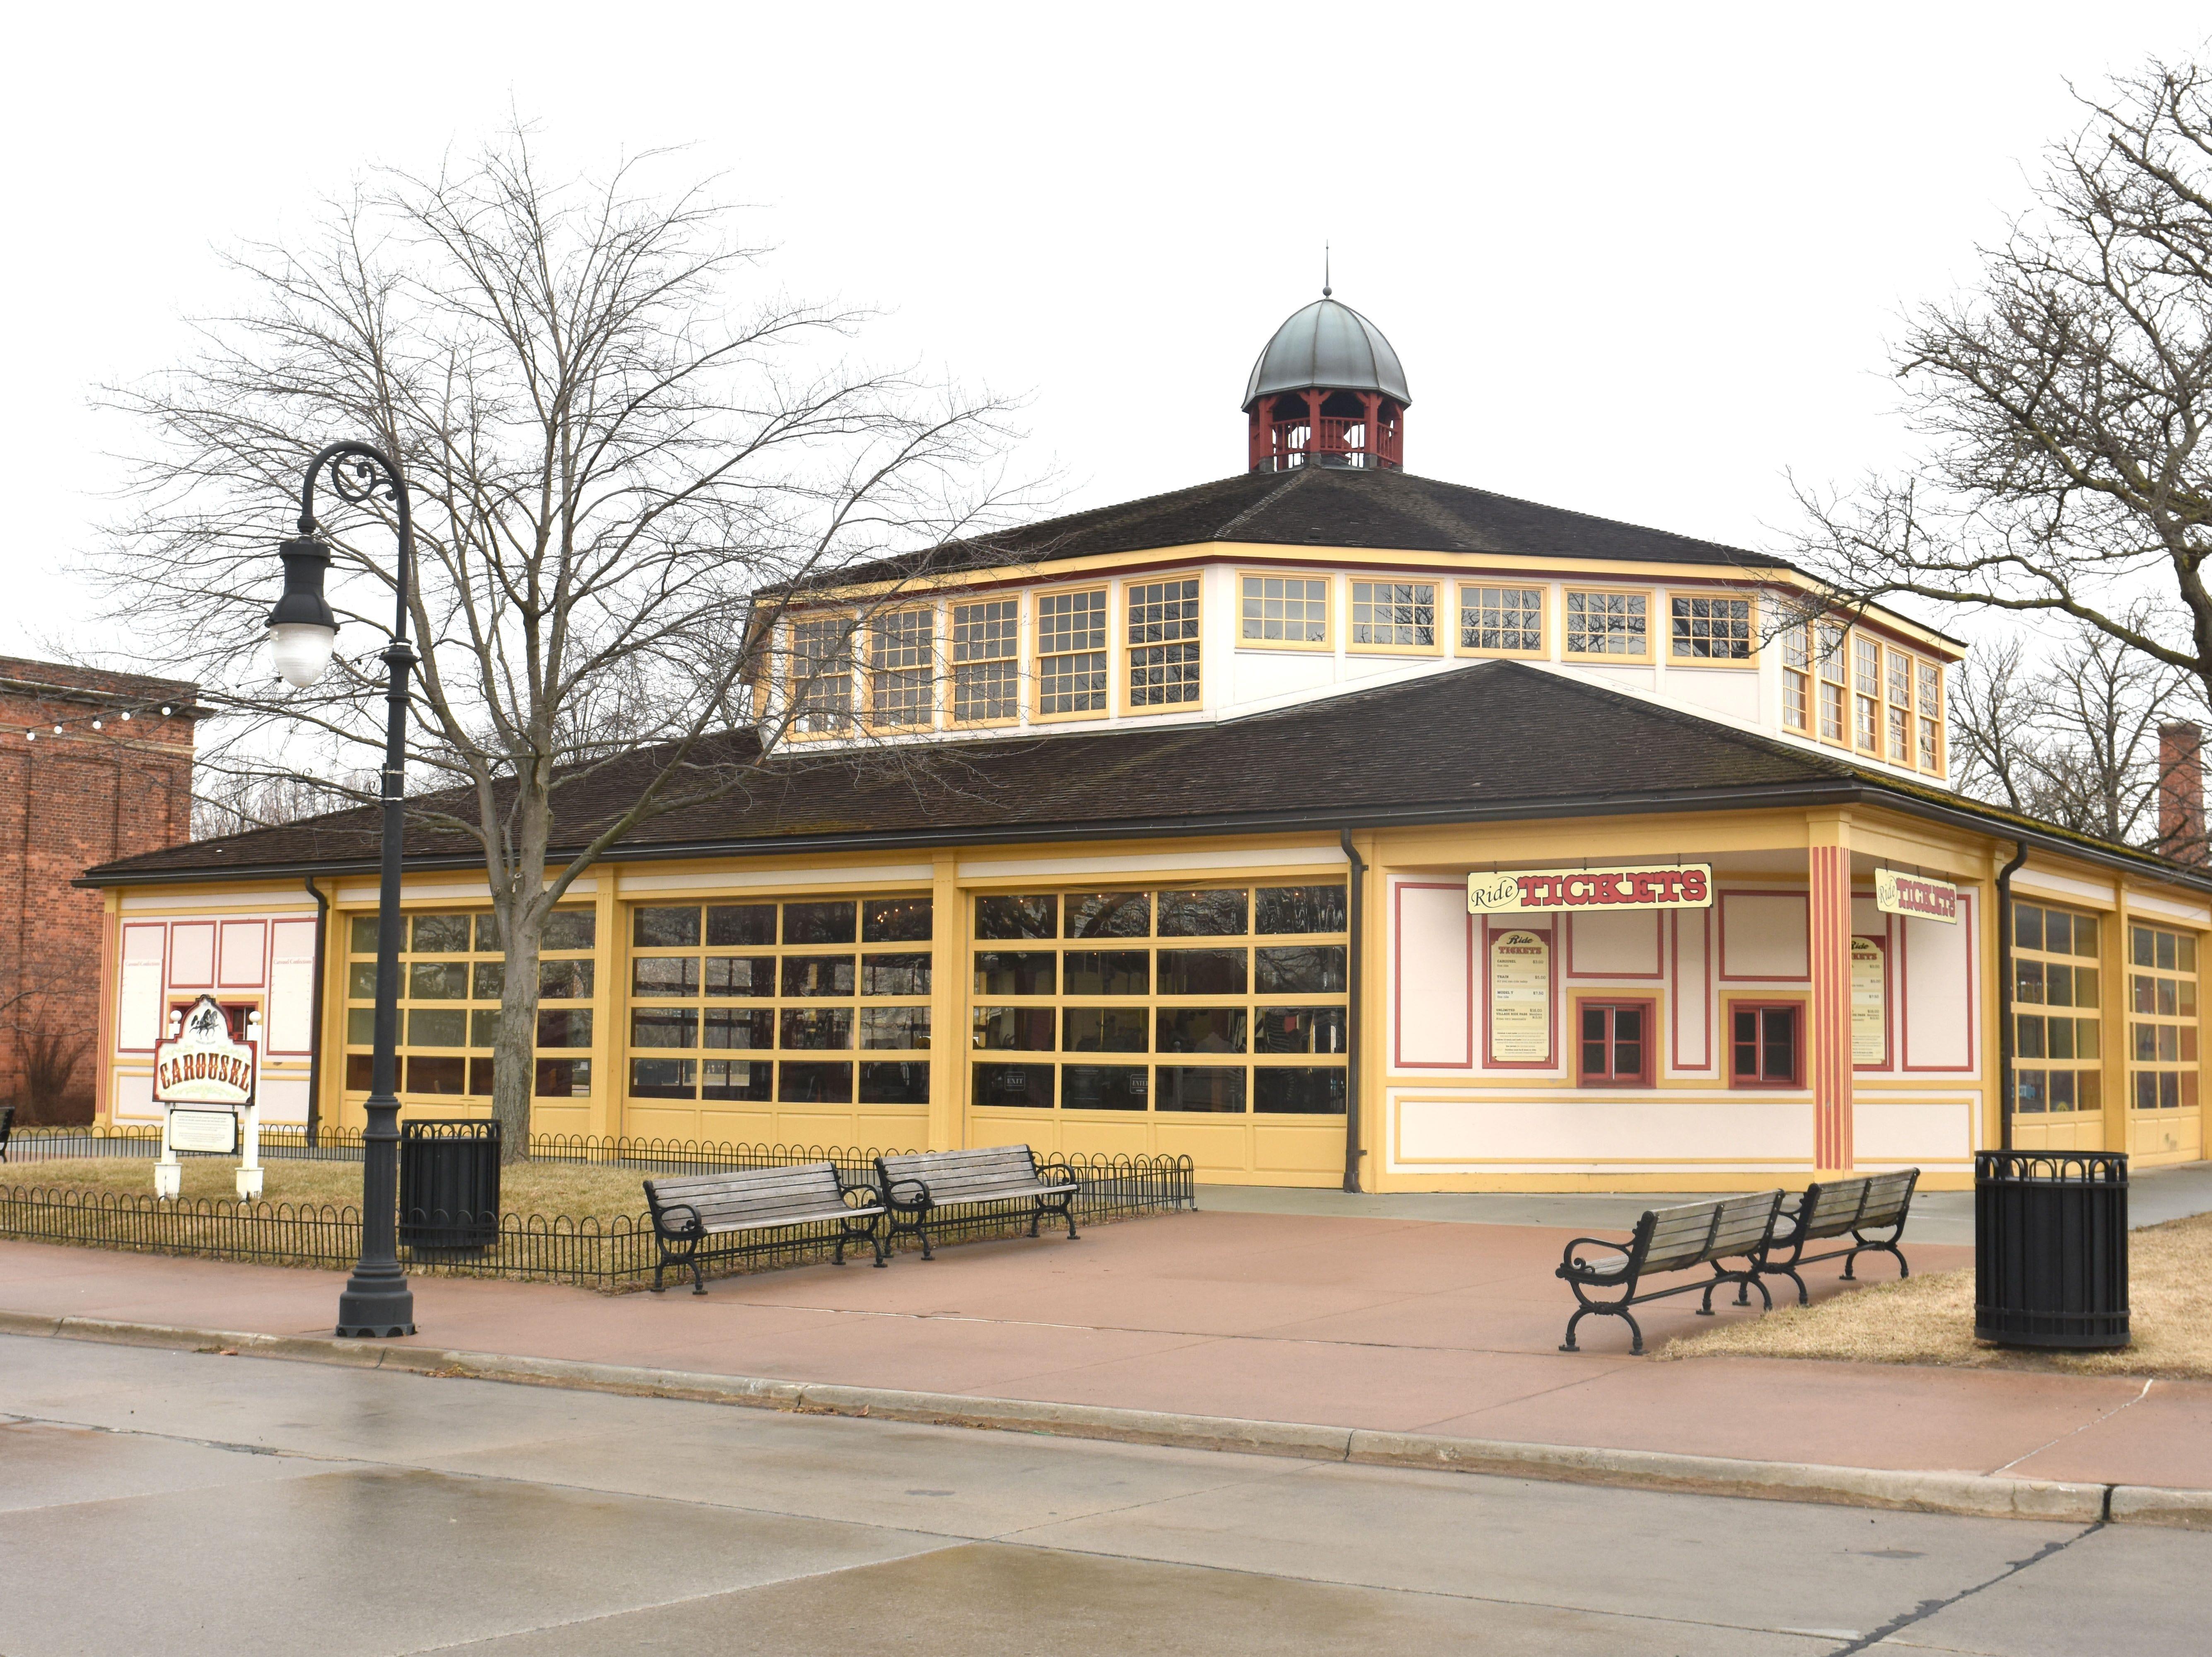 The 1912 Herschell-Spillman Carousel building gets a well needed restoration at Greenfield Village